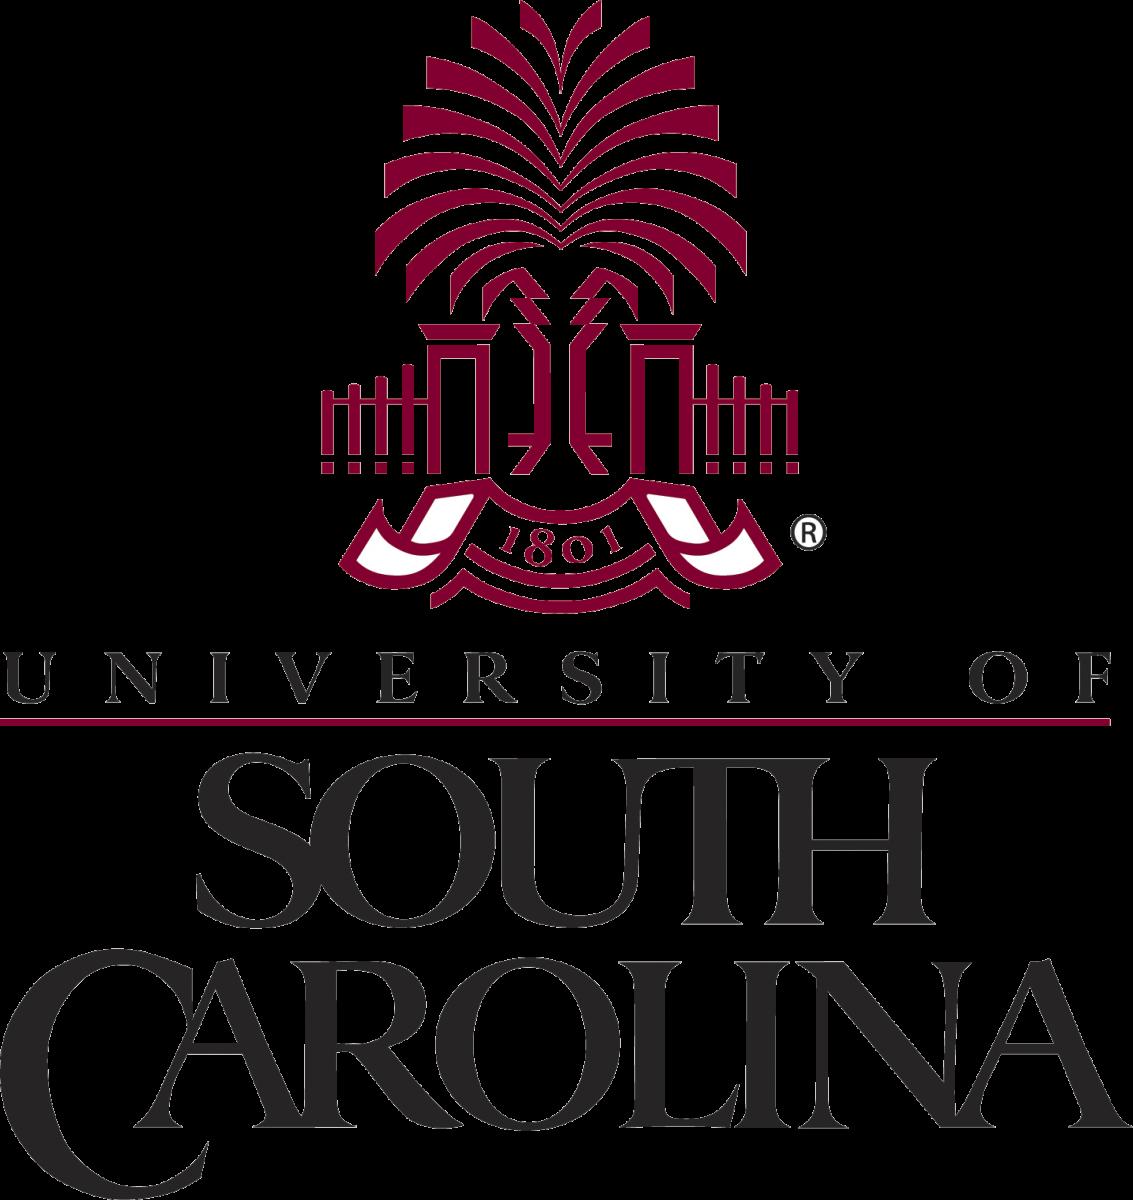 University Of South Carolina Columbia Logo University Of South Carolina South Carolina South Carolina Gamecocks